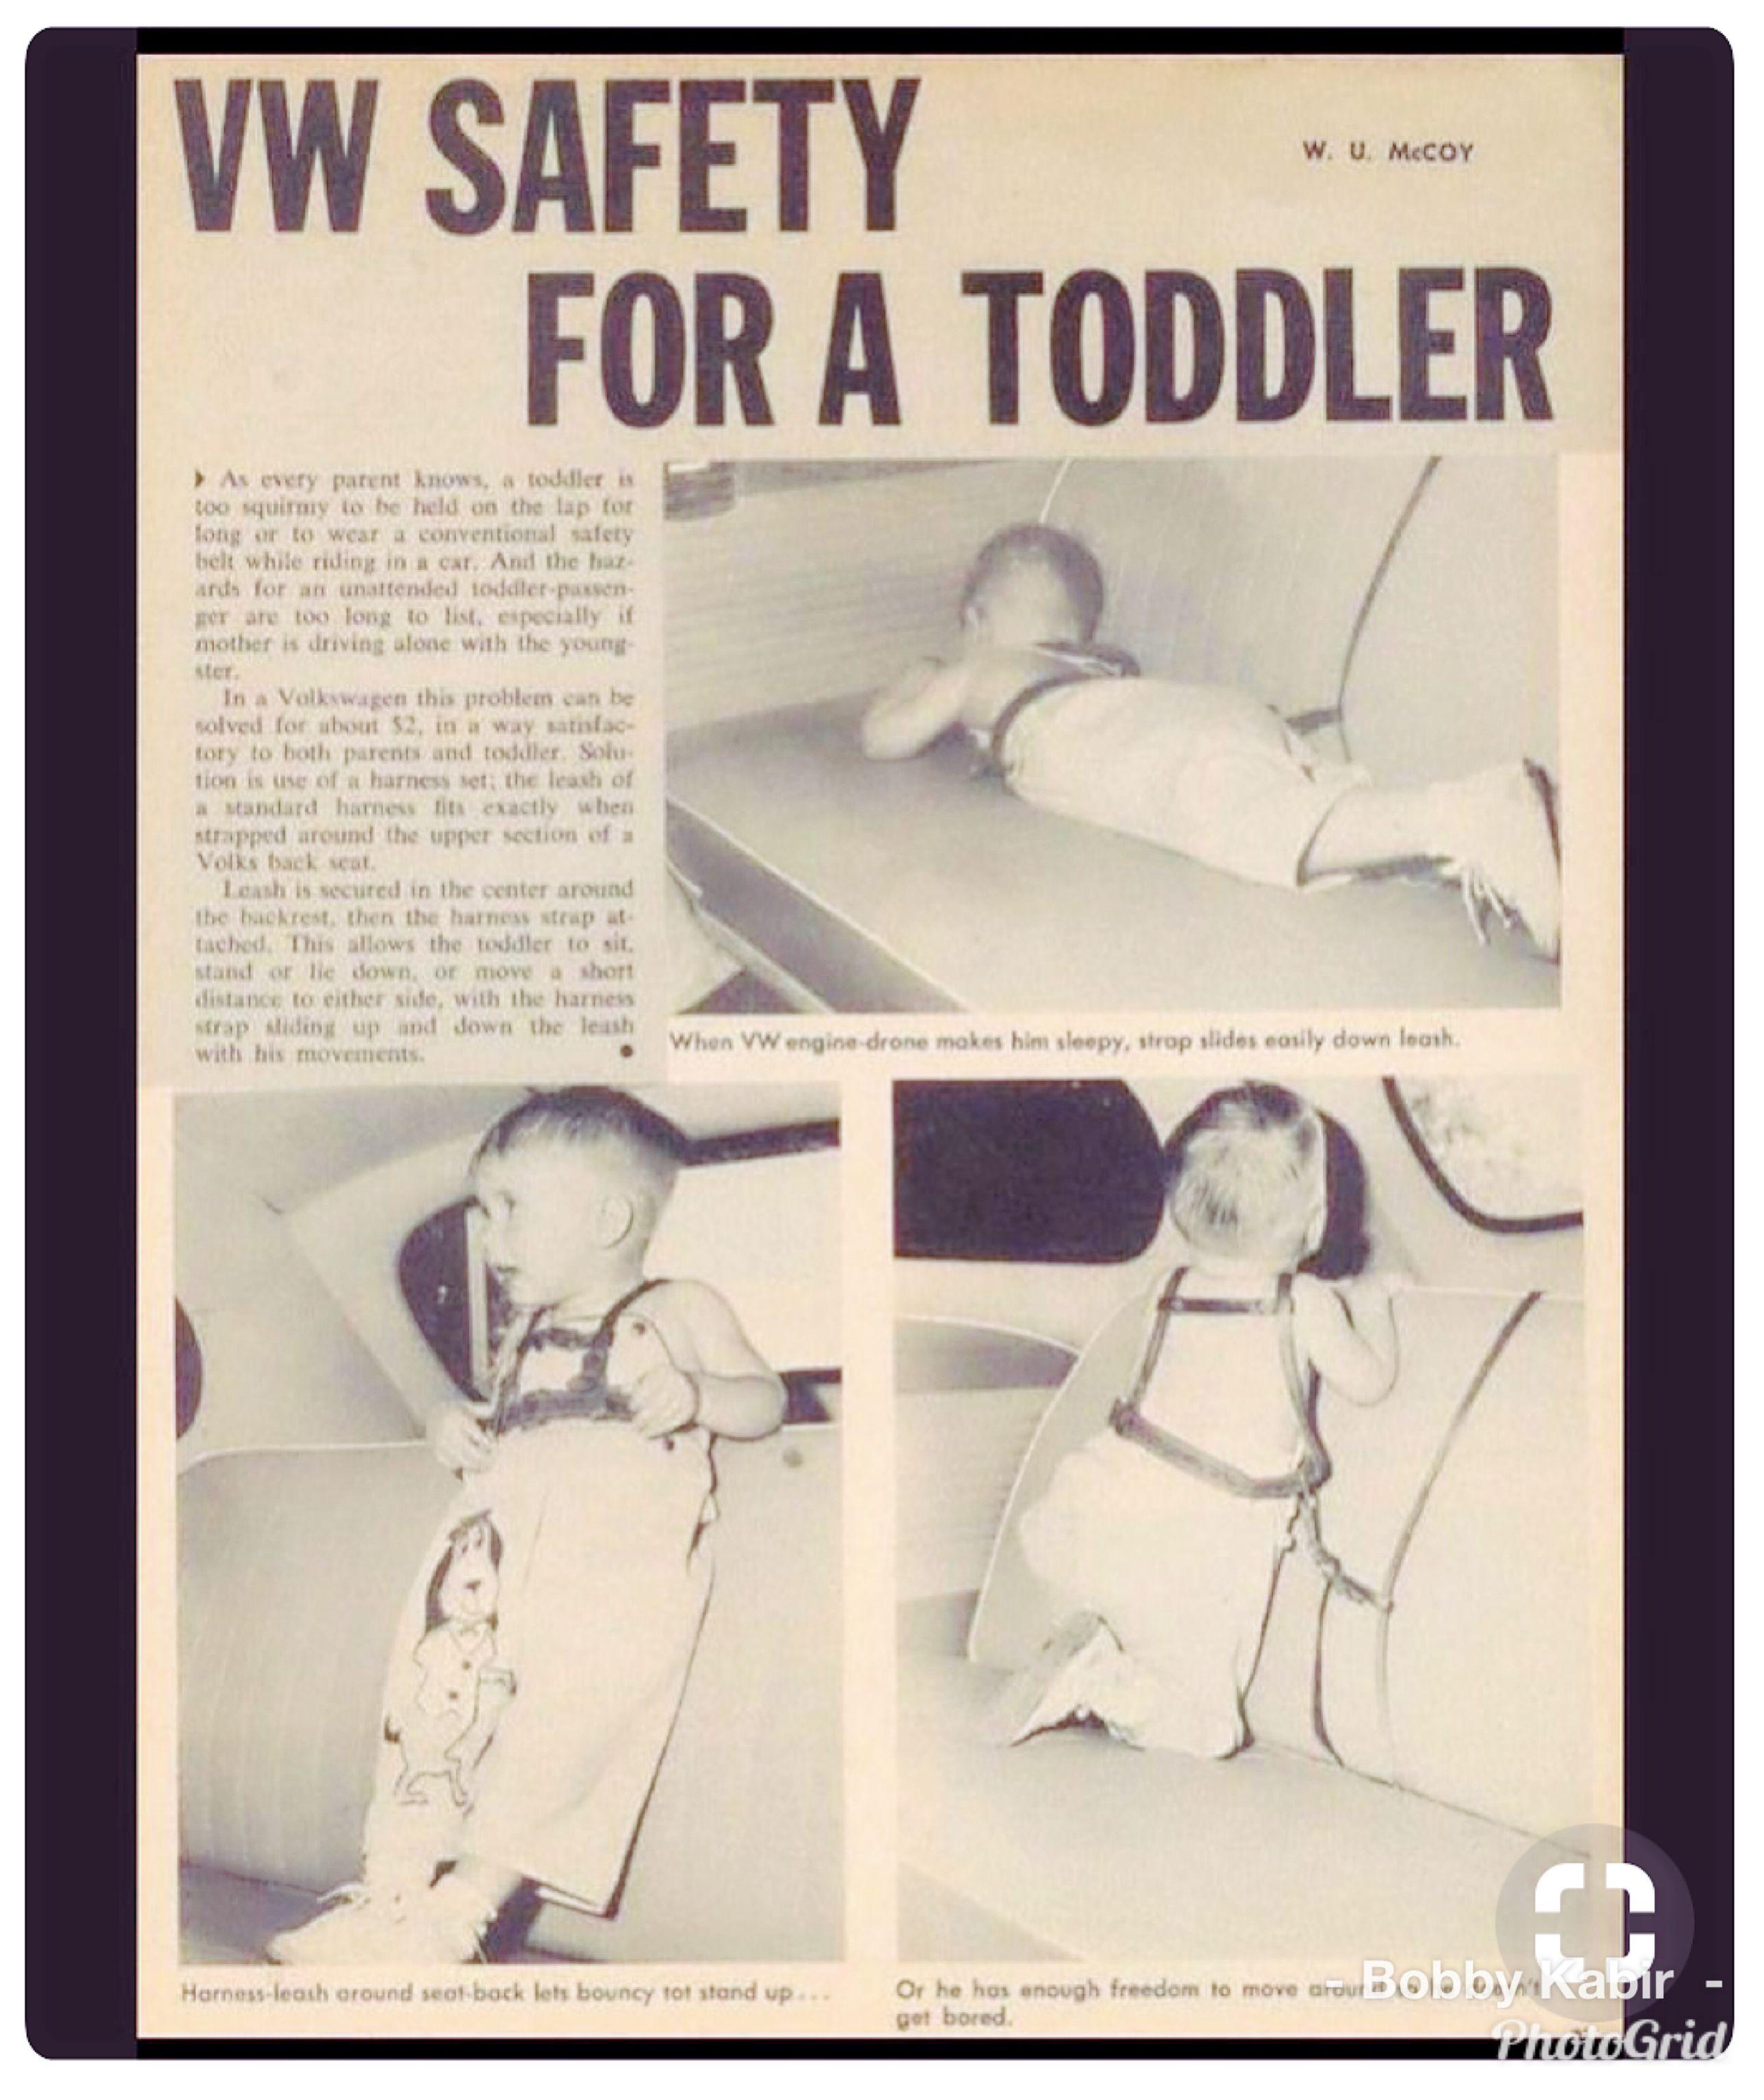 Volkswagen Safety         !! | Autos | Funny vintage ads